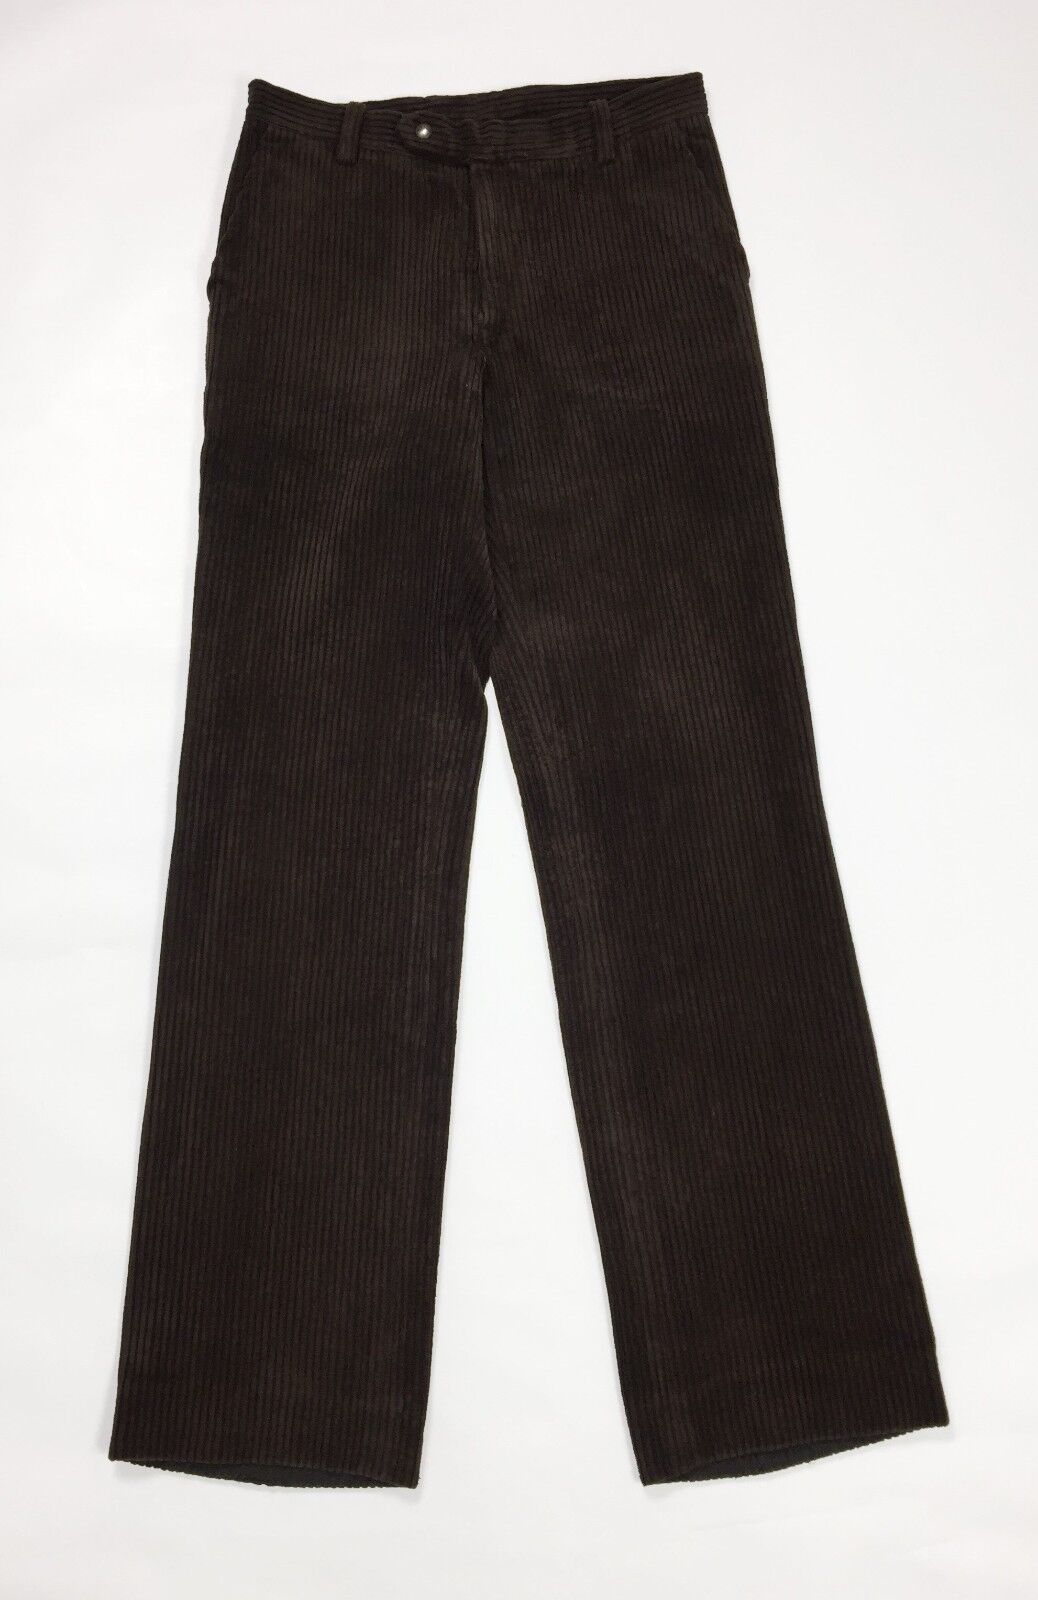 Pantalone velluto a coste usato brown gamba dritta invernali vintage T3018